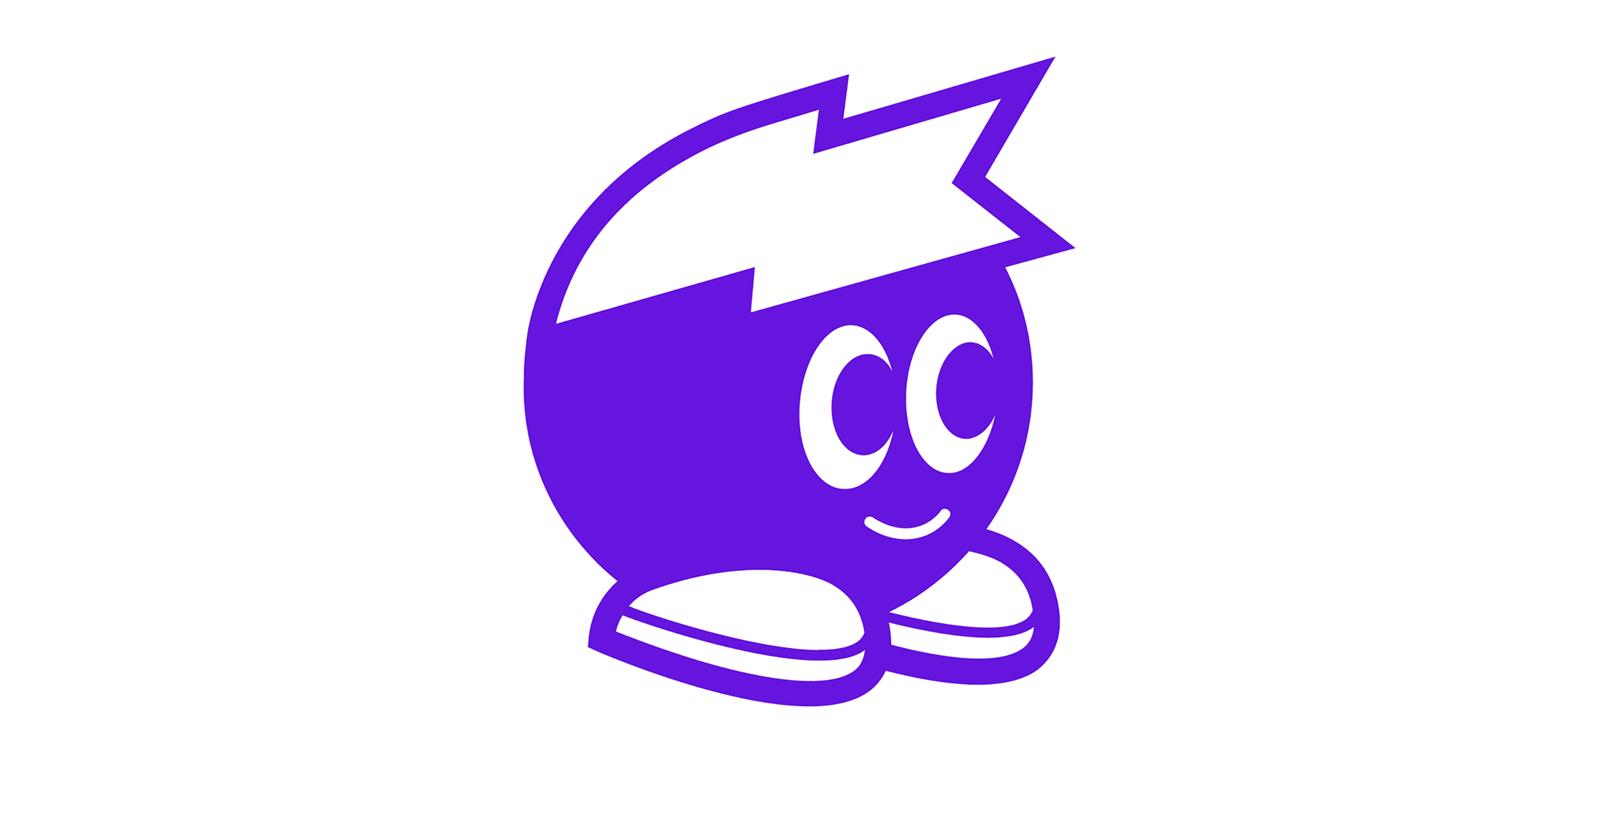 Clubhouse 品牌启用新的logo和形象设计-VI设计4